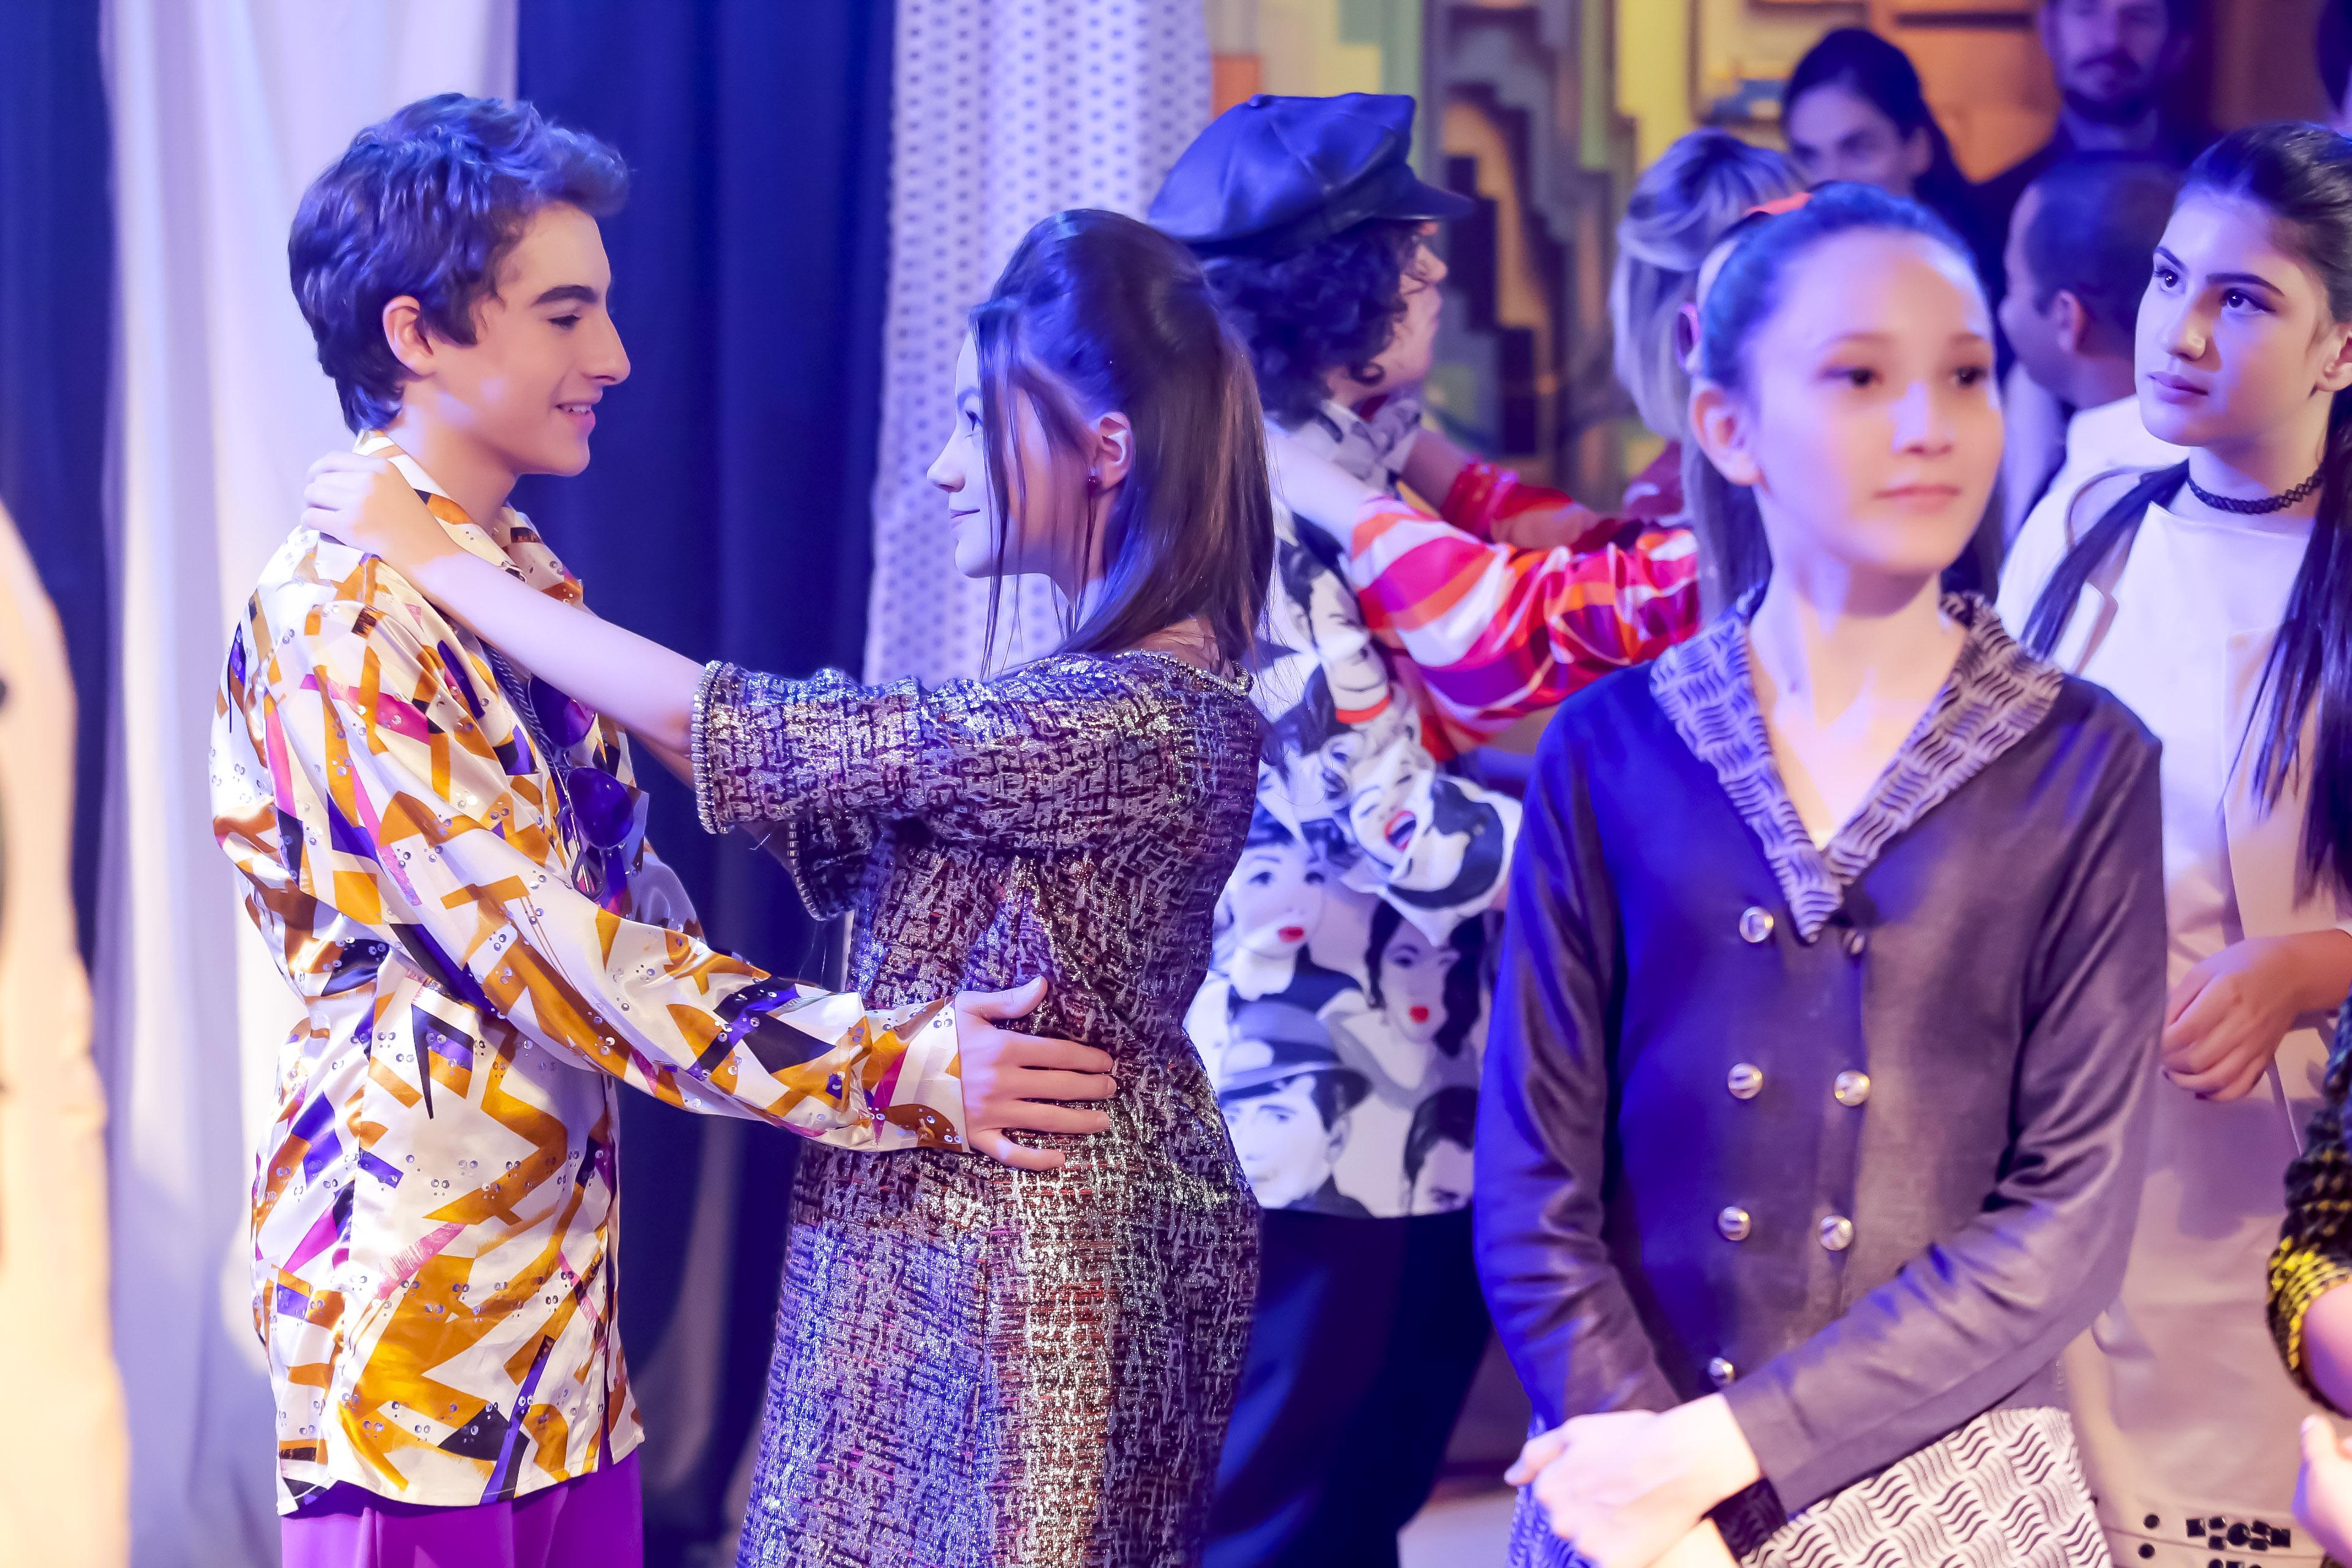 Filipa danca com Eric_Foto_Gabriel_Cardoso_SBT (6)